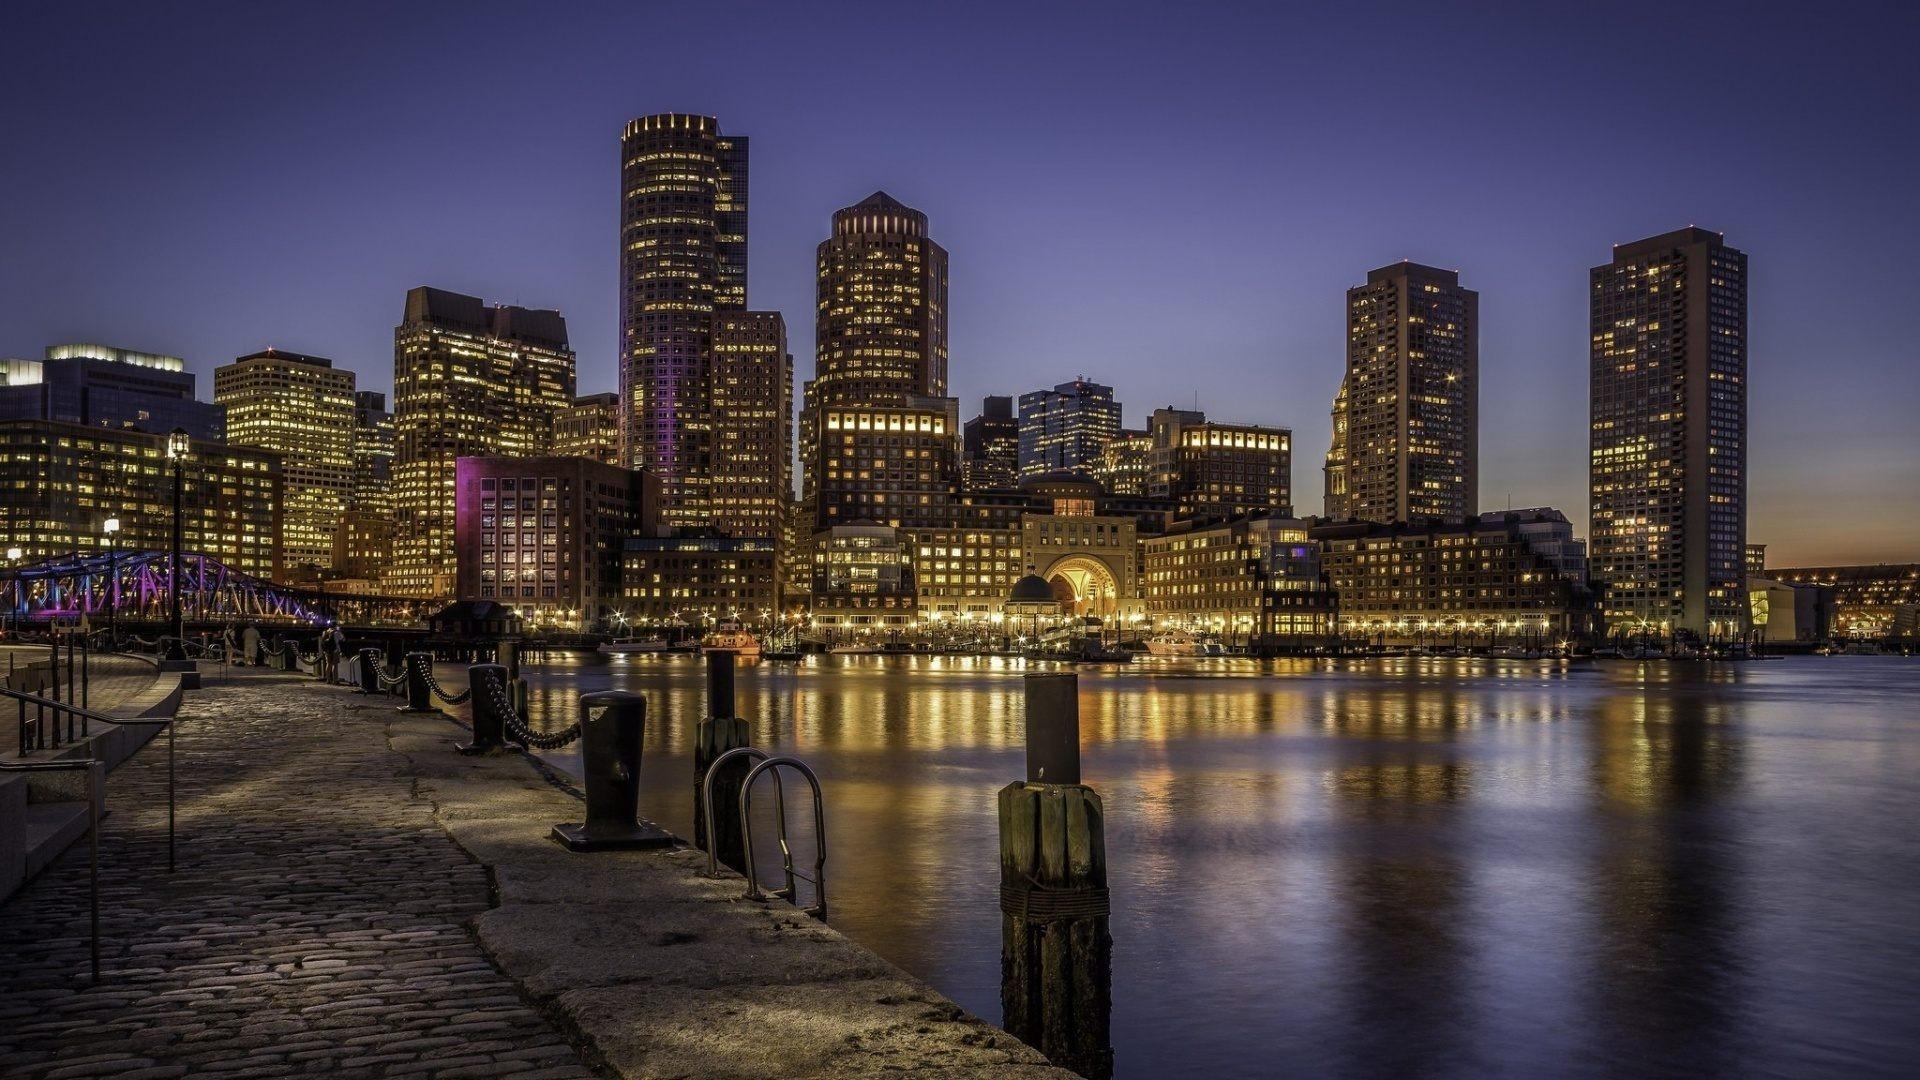 Real Hd Wallpapers 1080p Boston Skyline Wallpaper 183 ①